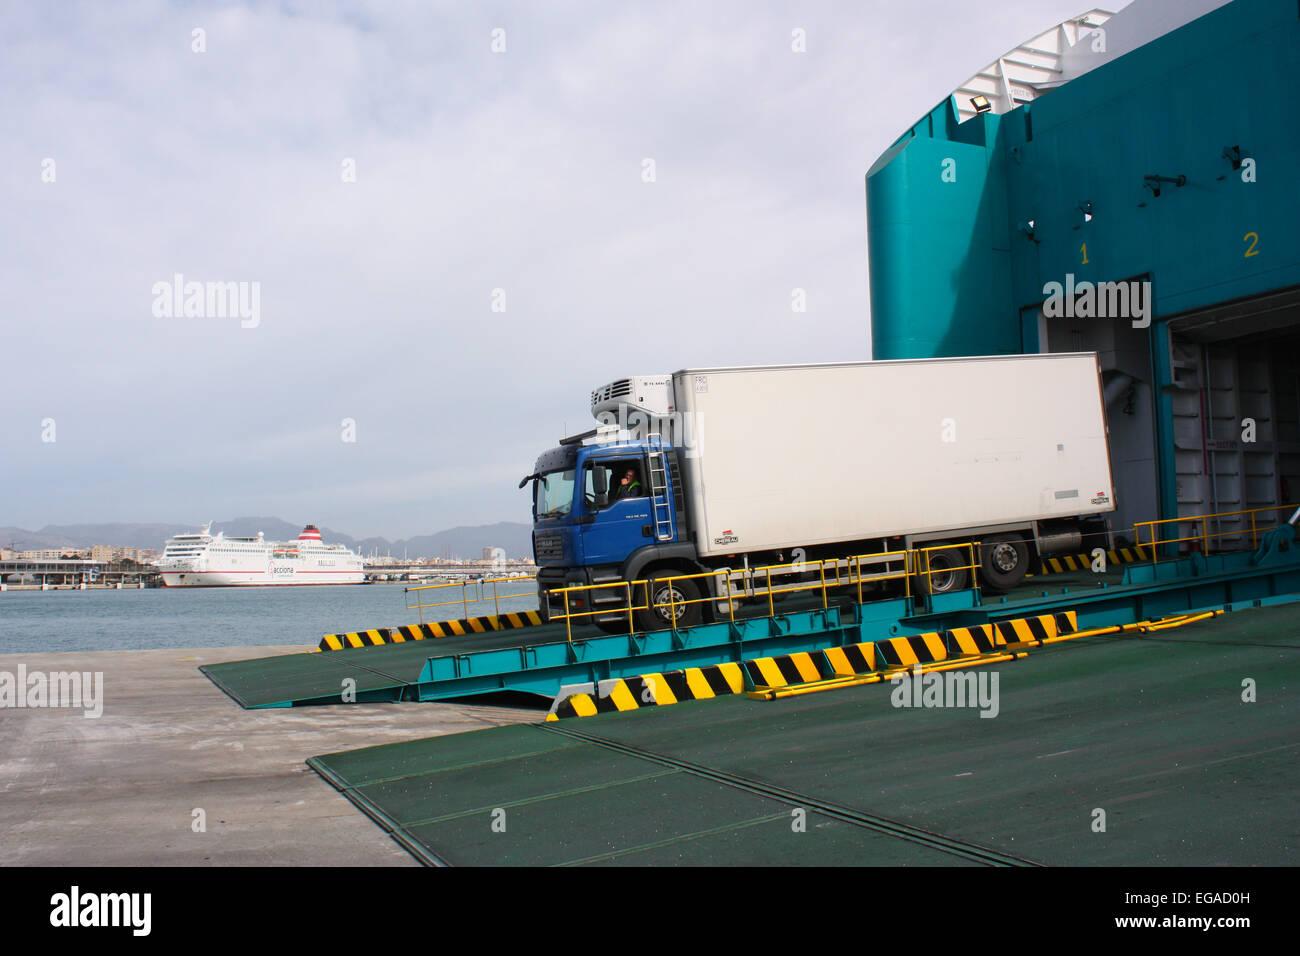 Transport truck on a ferry in Palma De Mallorca, Spain Stock Photo